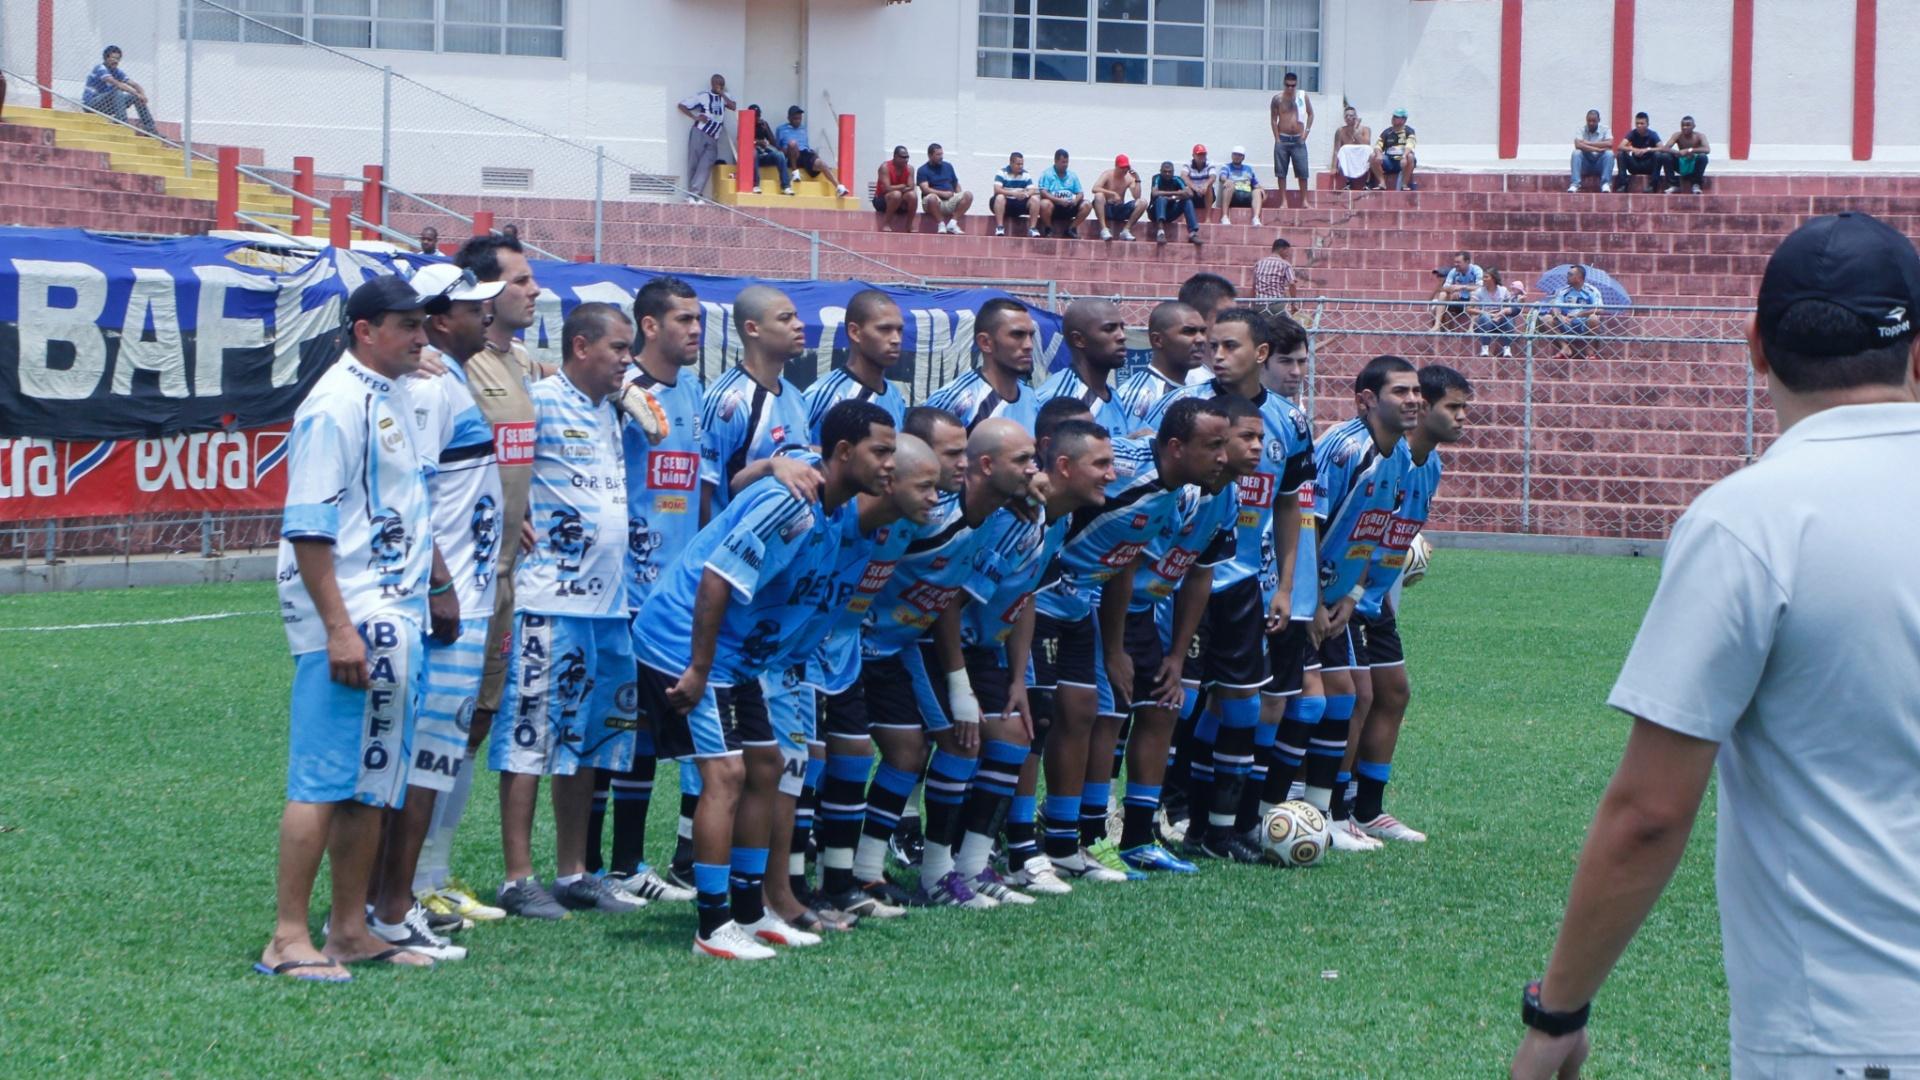 Jogadores do Turma do Baffo posam para foto antes da semifina da Copa Kaiser 2012 contra o Noroeste